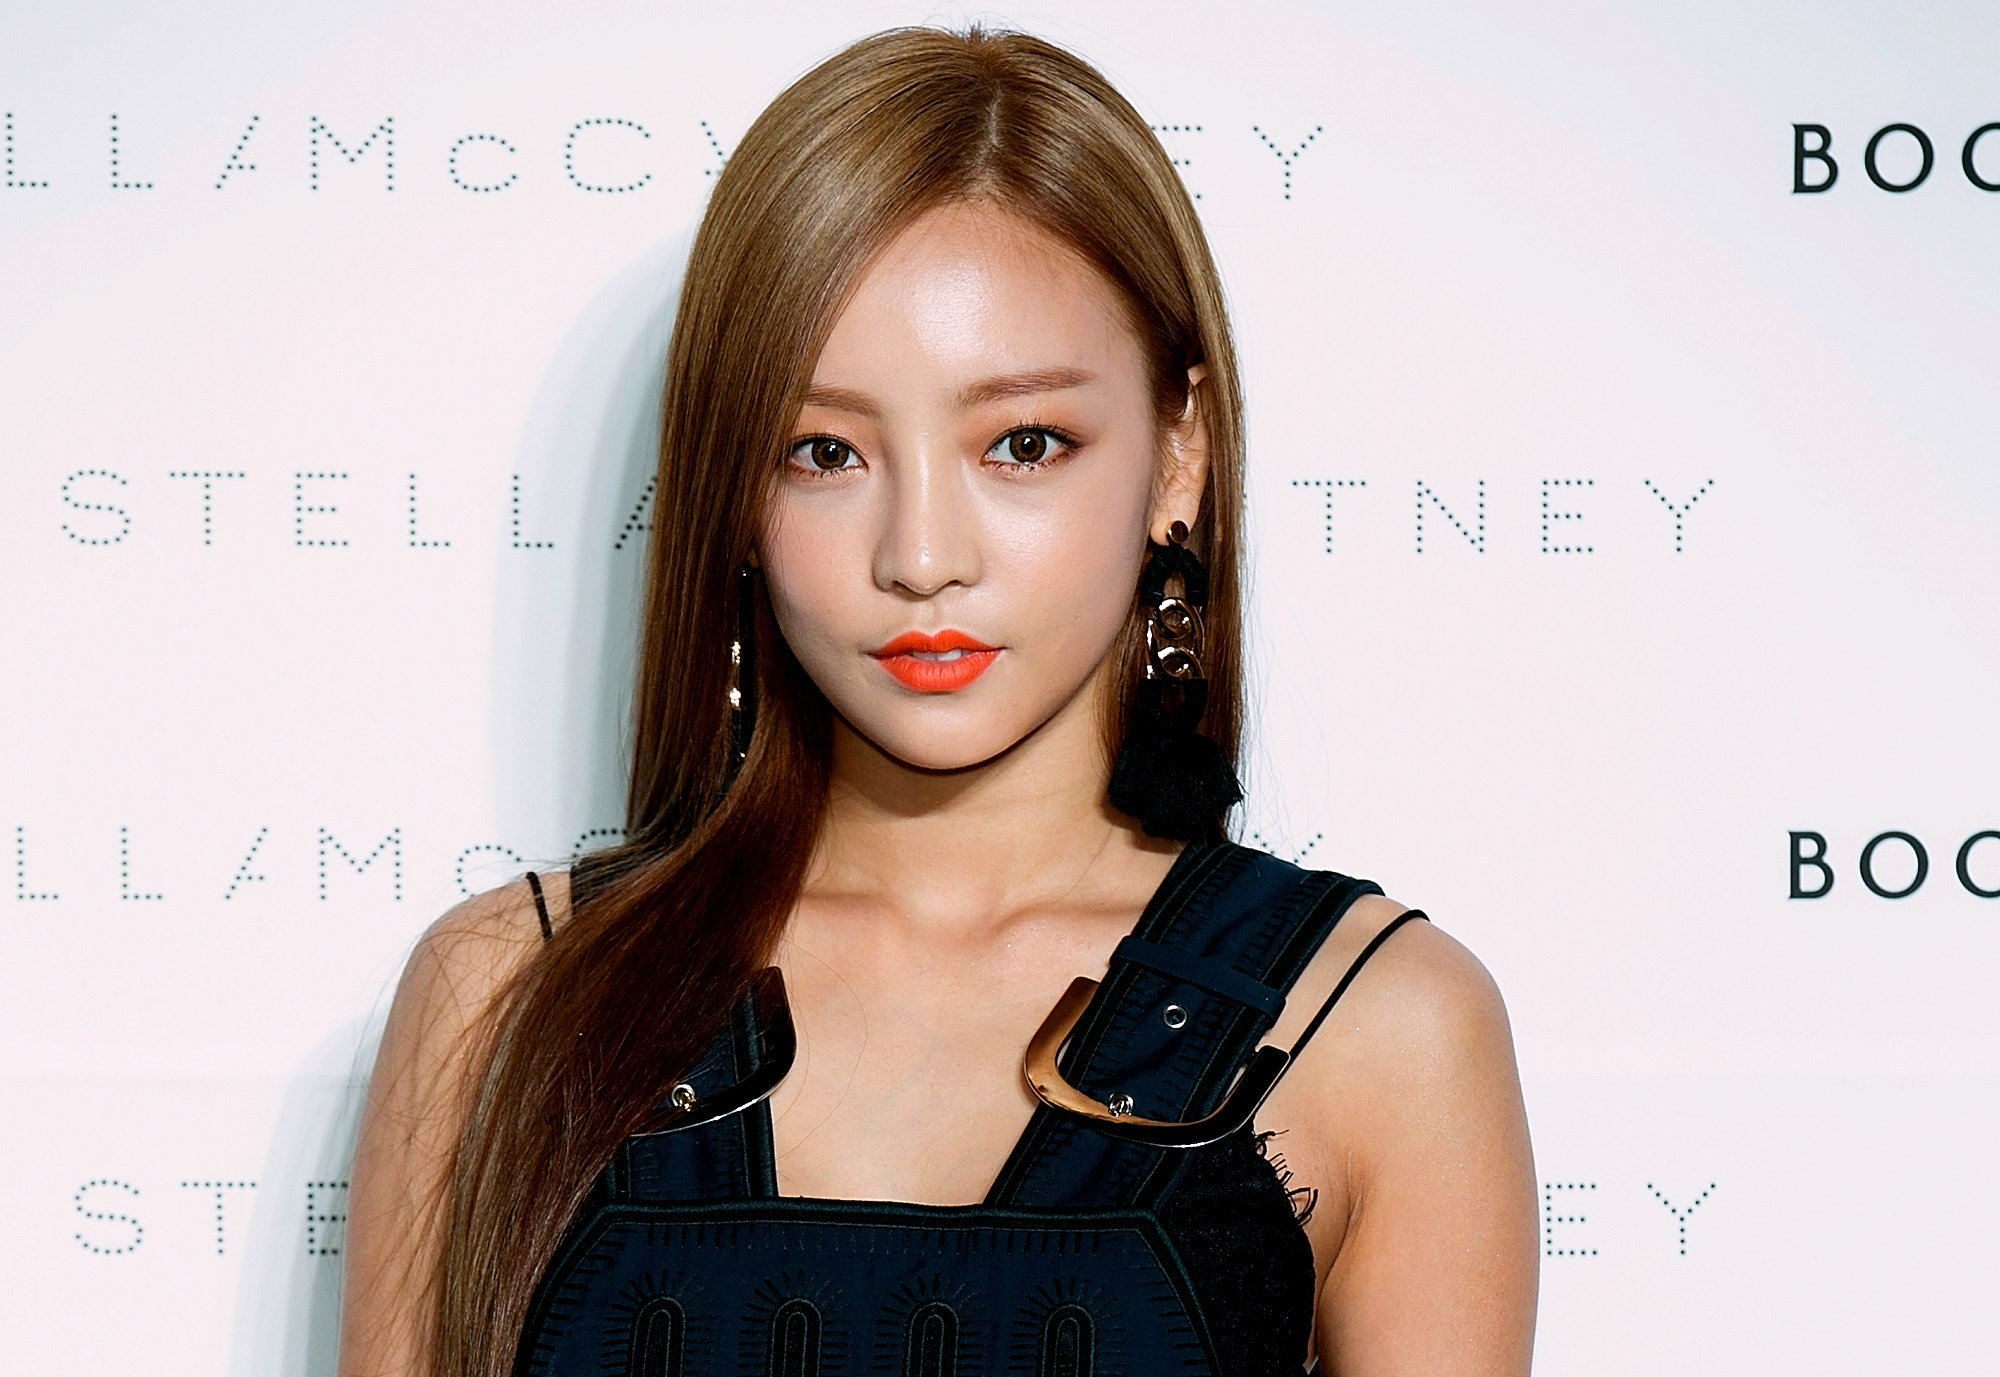 death of k pop star goo hara instigates debate on bullying